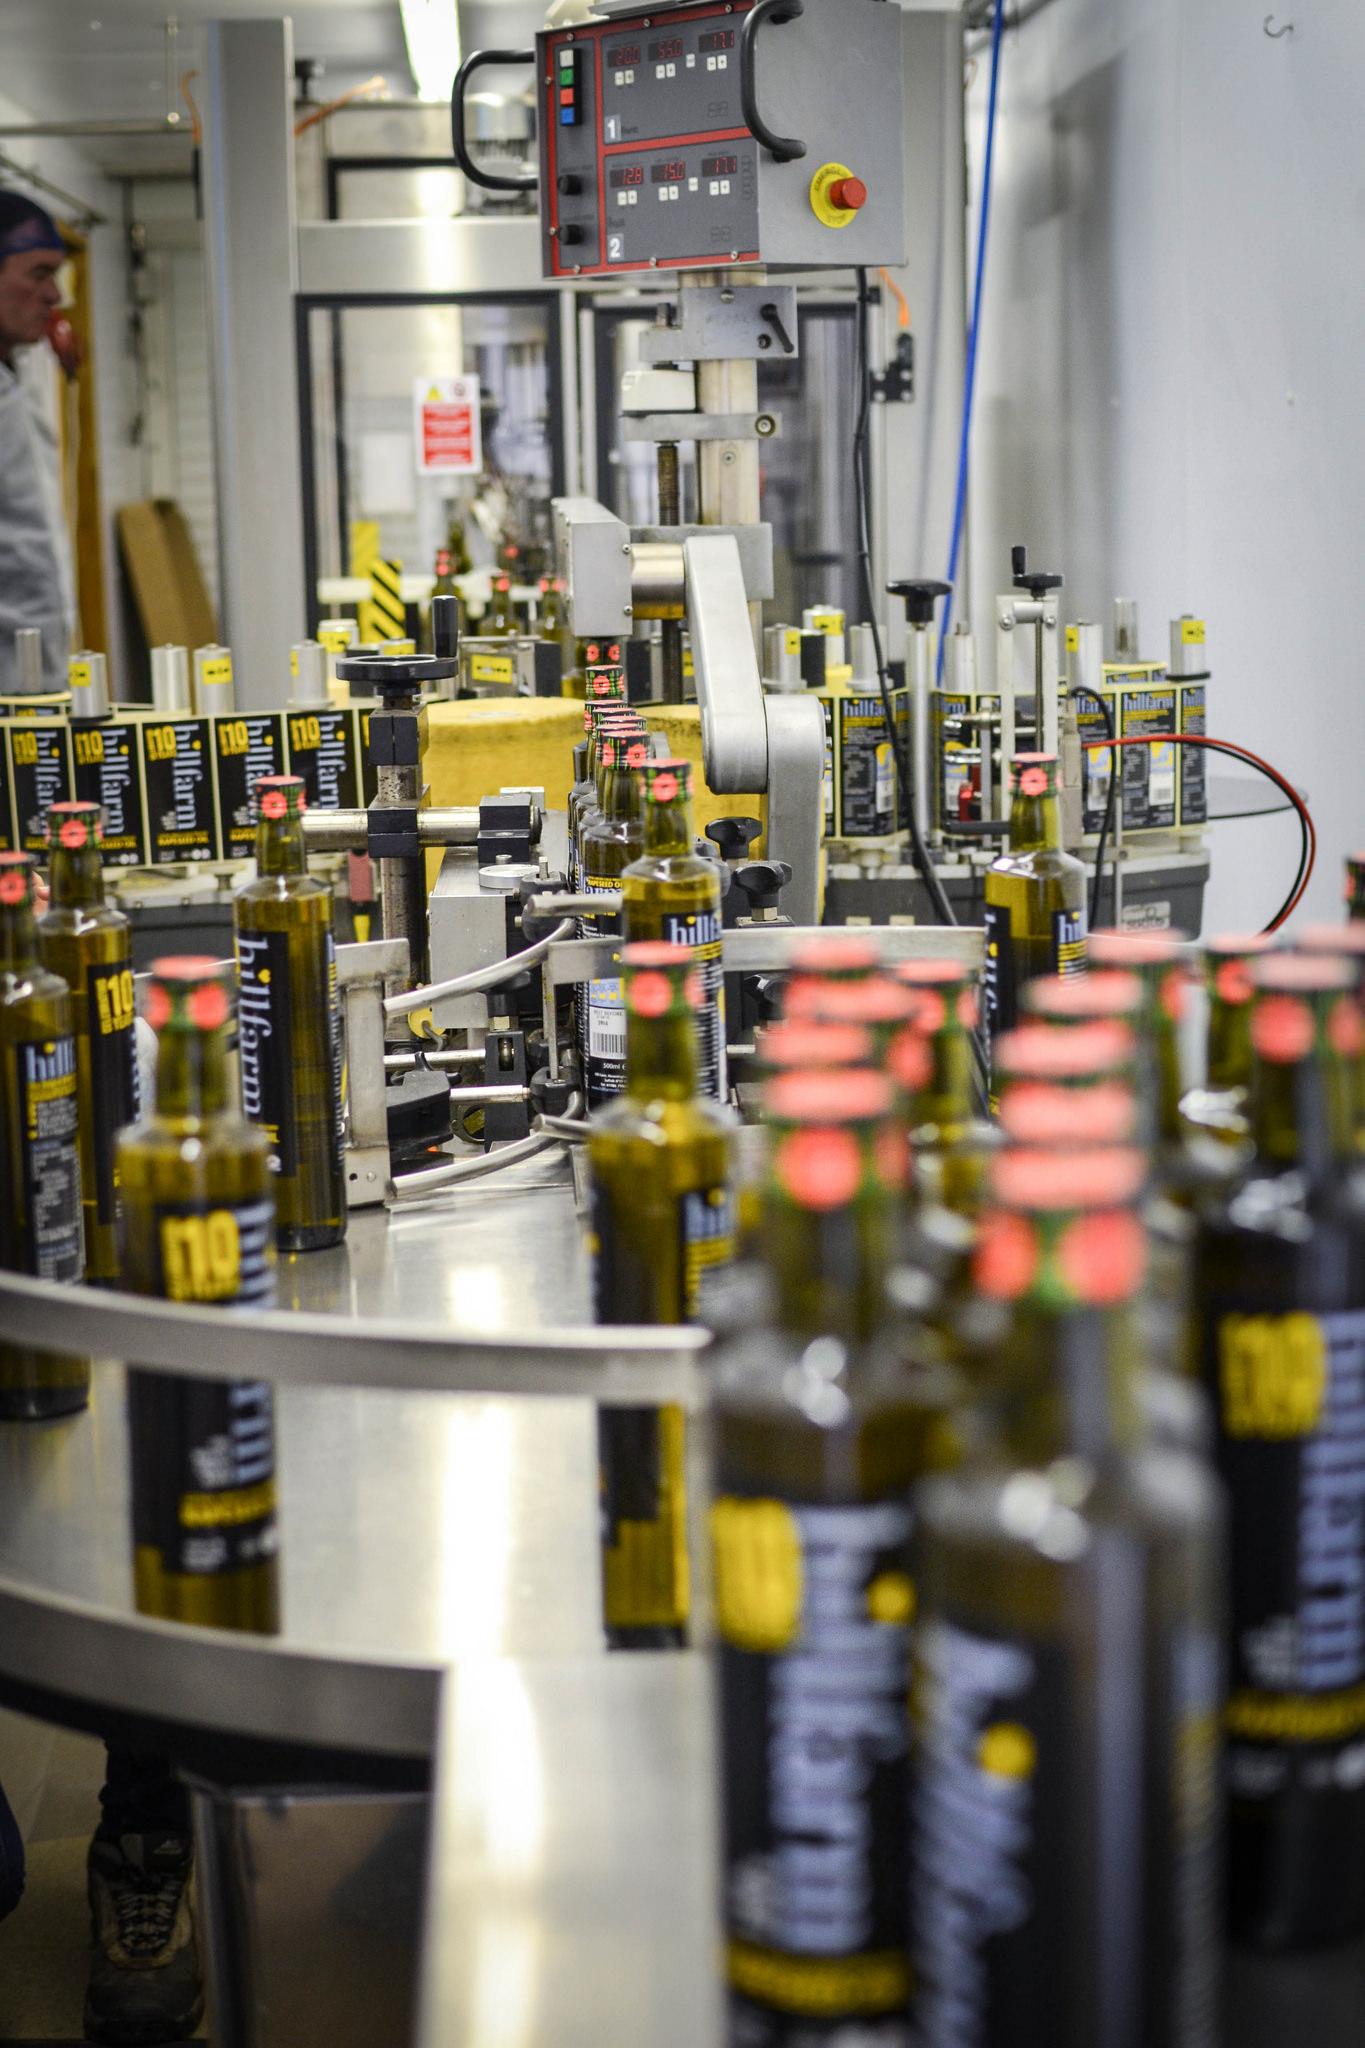 Hillfam Rapeseed Oil Bottles commemorating the anniversary of WW1